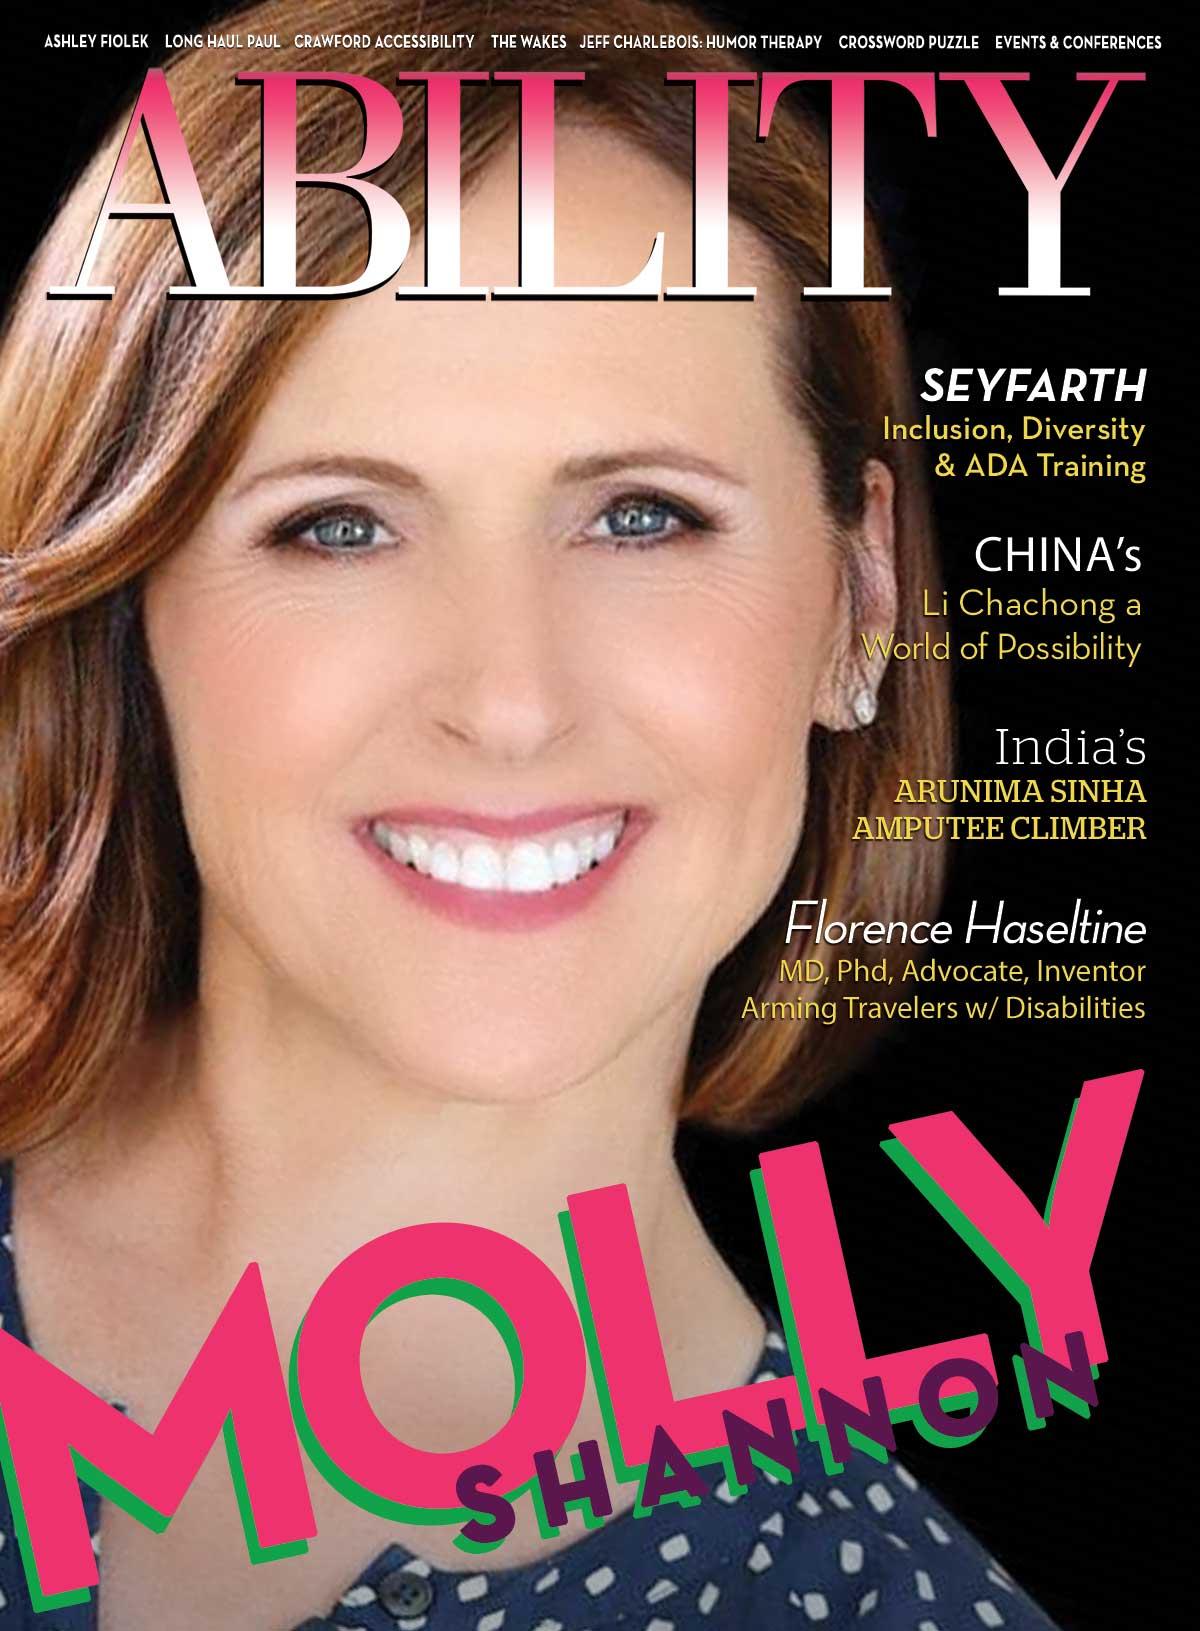 ABILITY Magazine Molly Shannon Cover